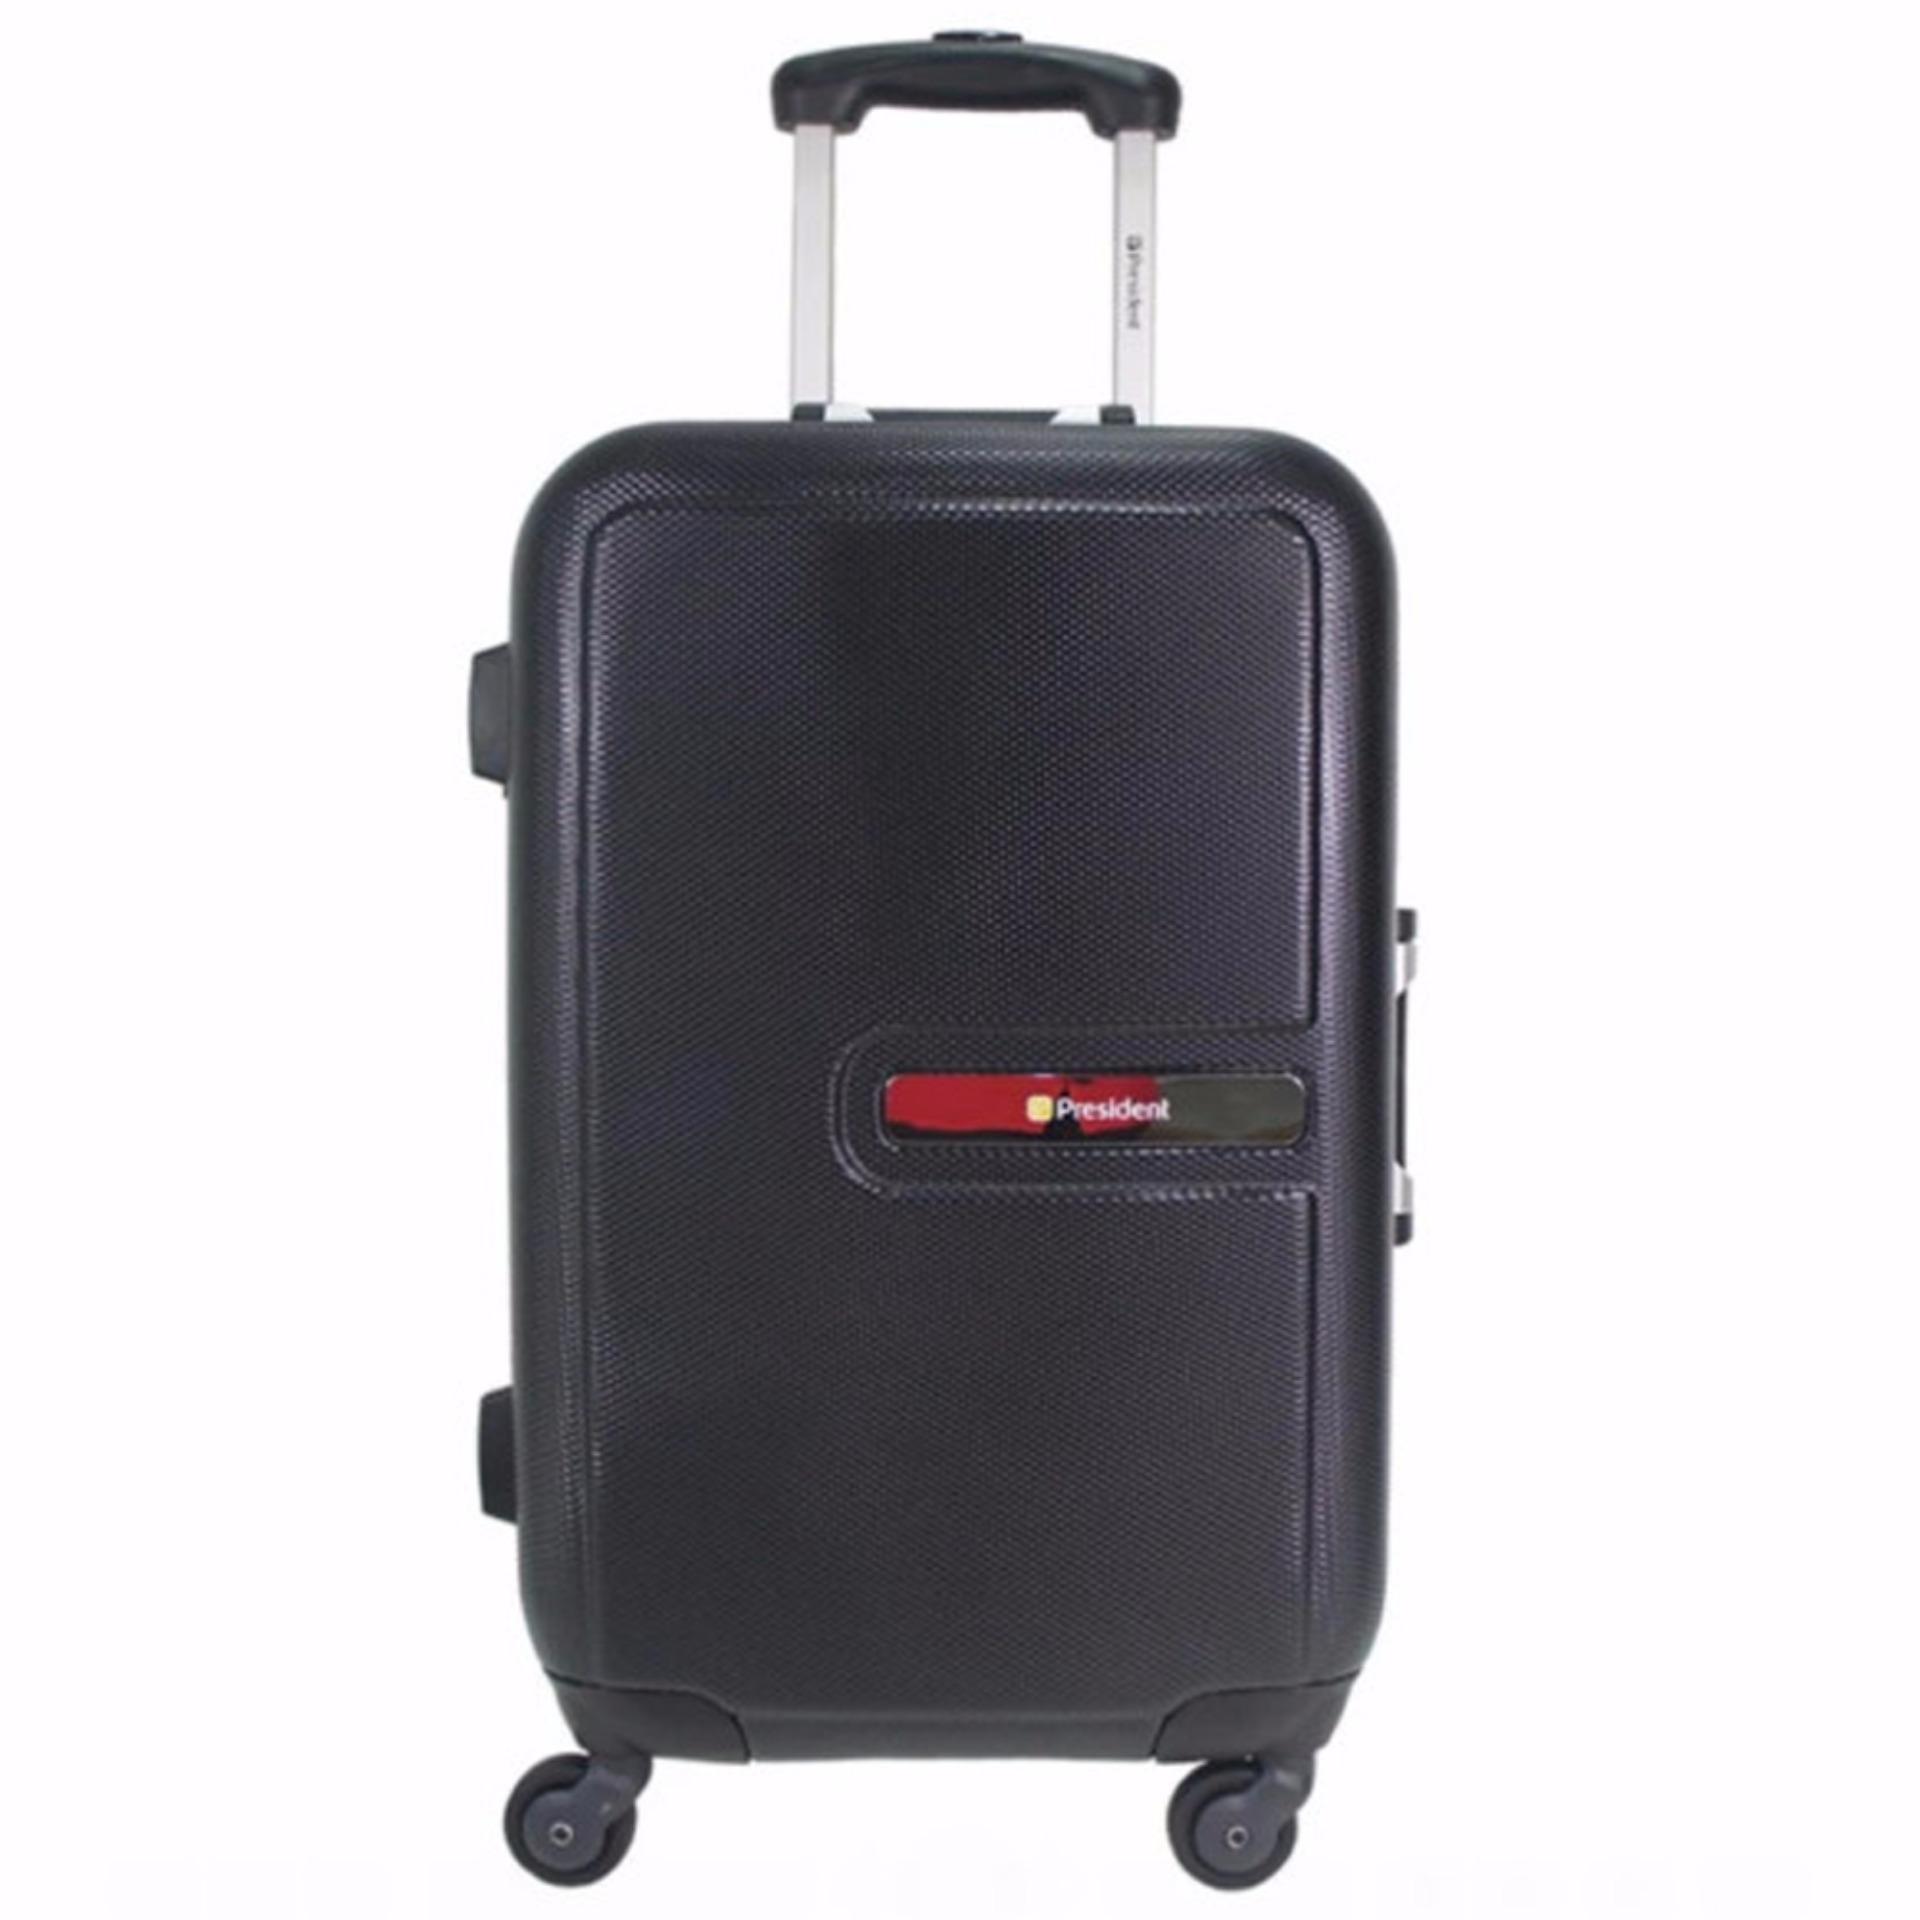 President Koper Hardcase Luggage 20 Inch 5267B-20 Travel Anti Theft Original - Black